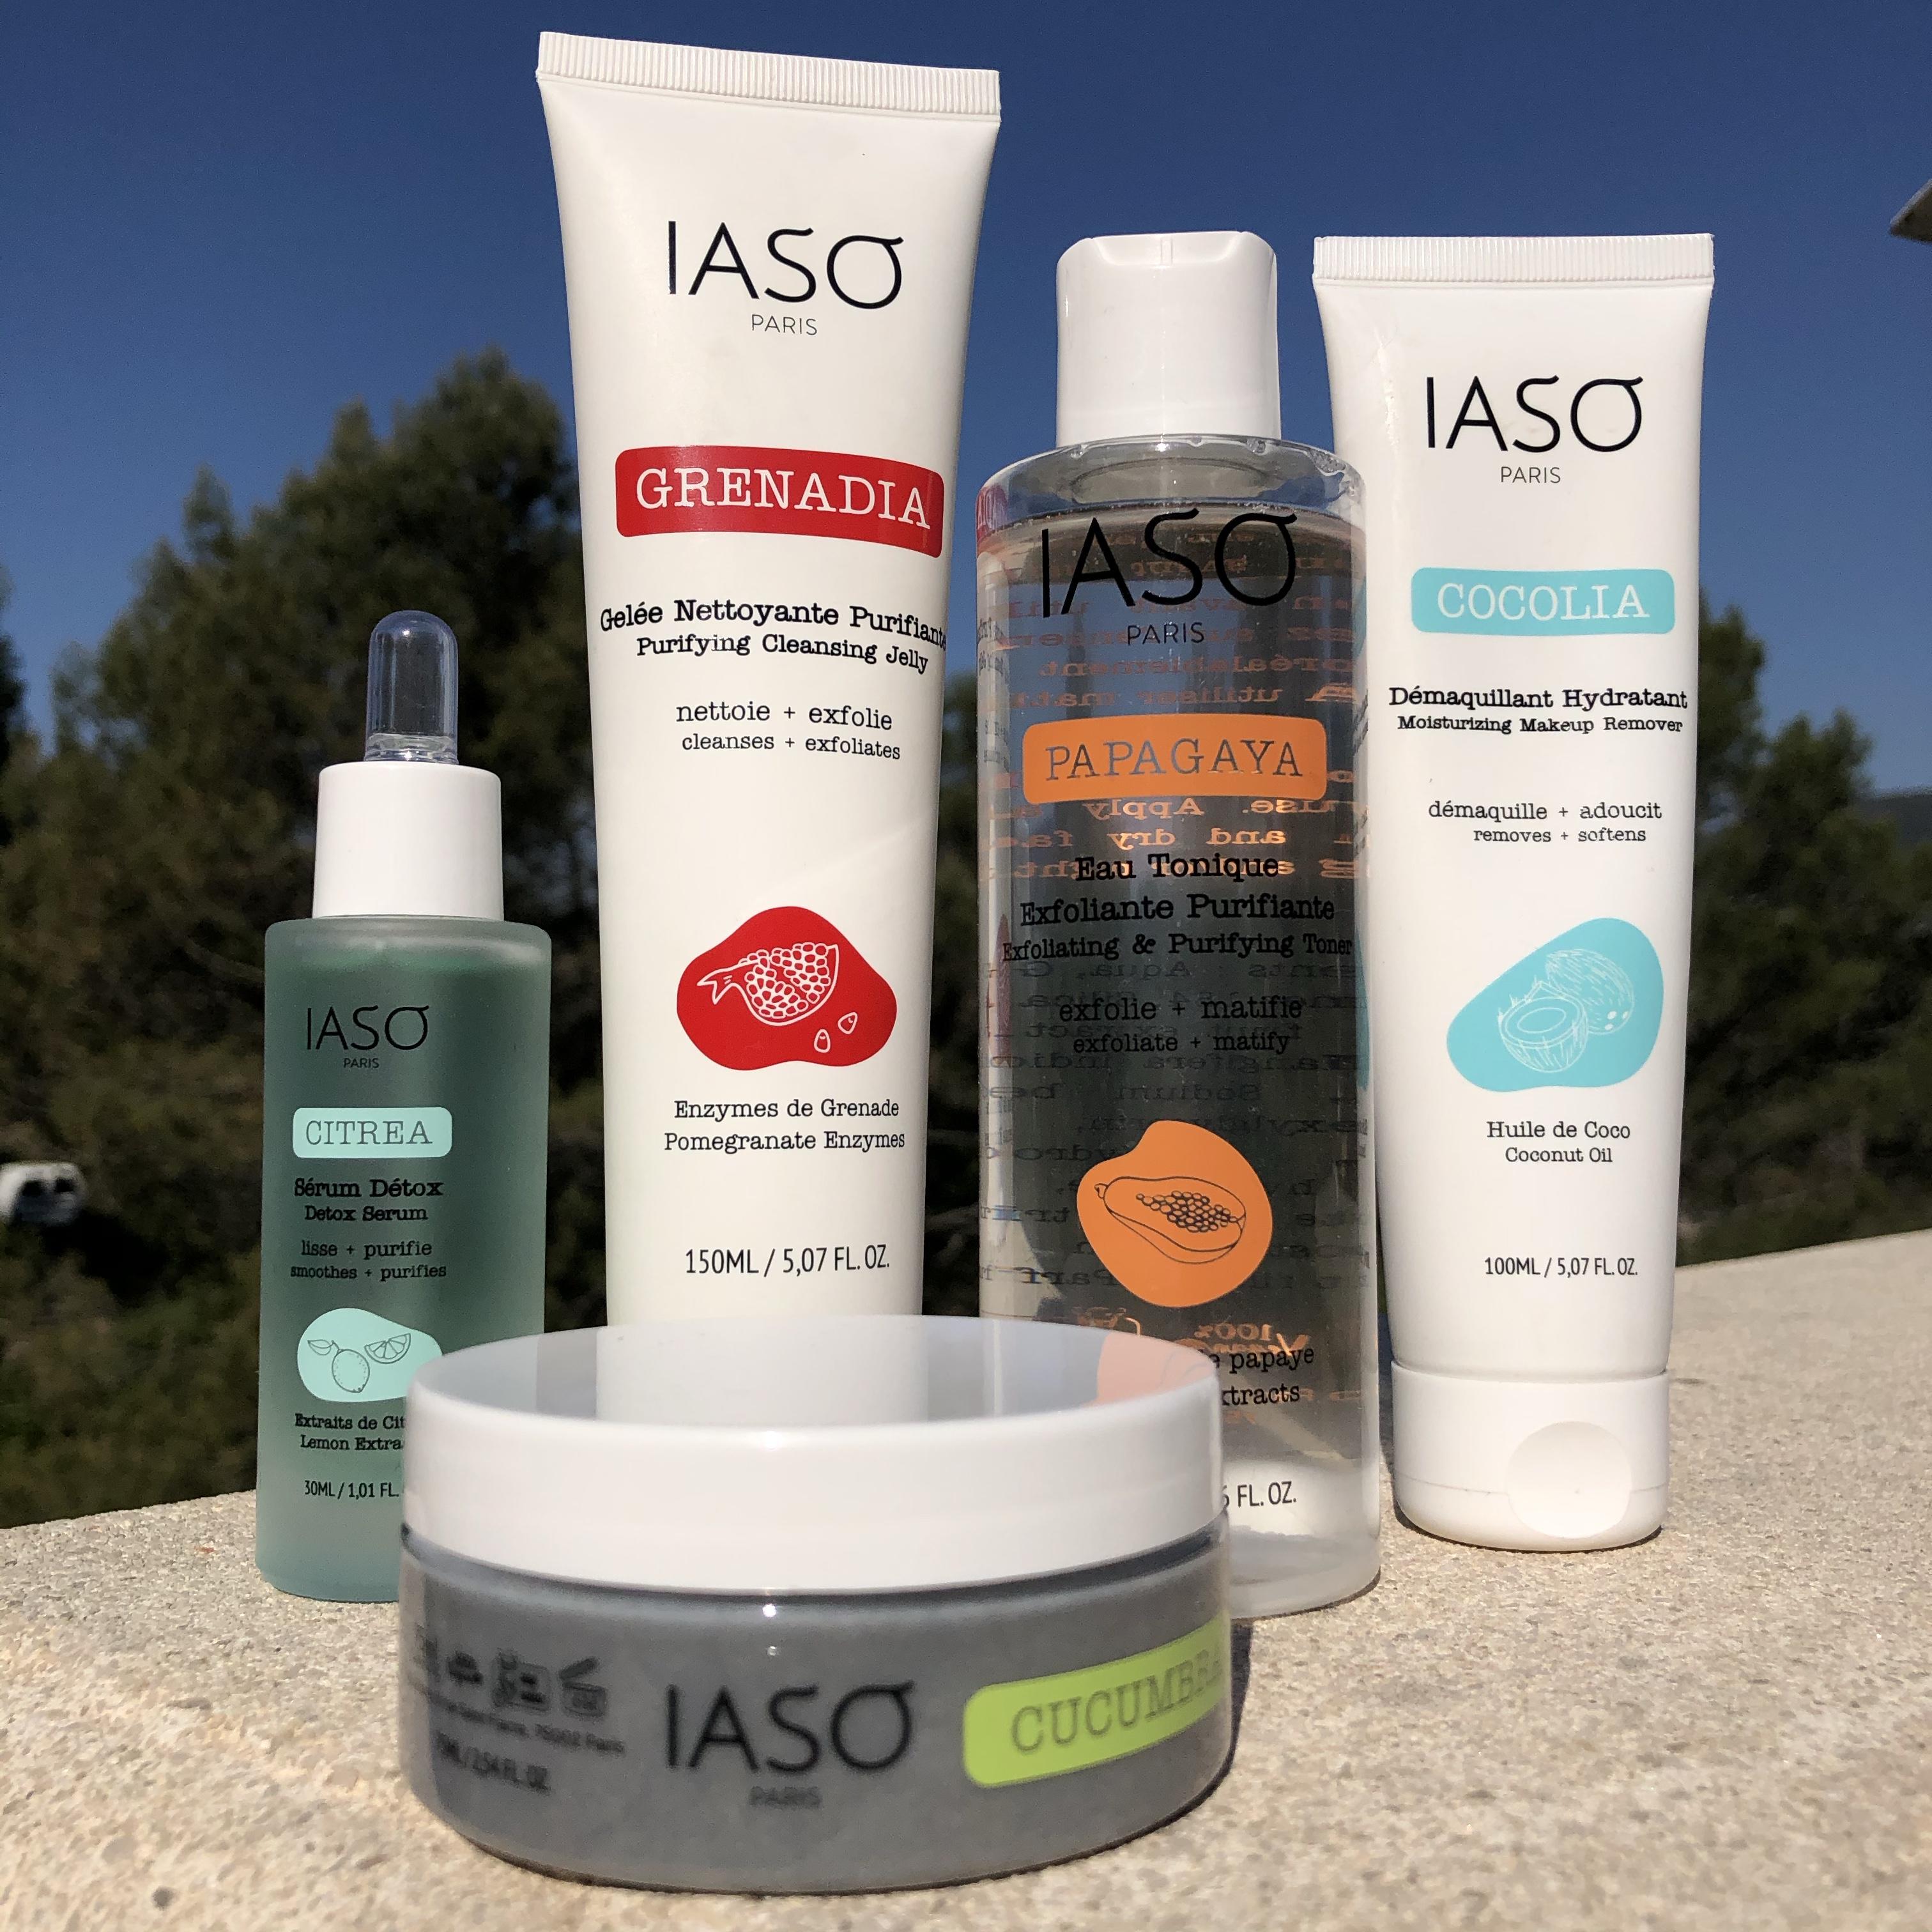 Ma routine soin IASO pour une peau parfaite